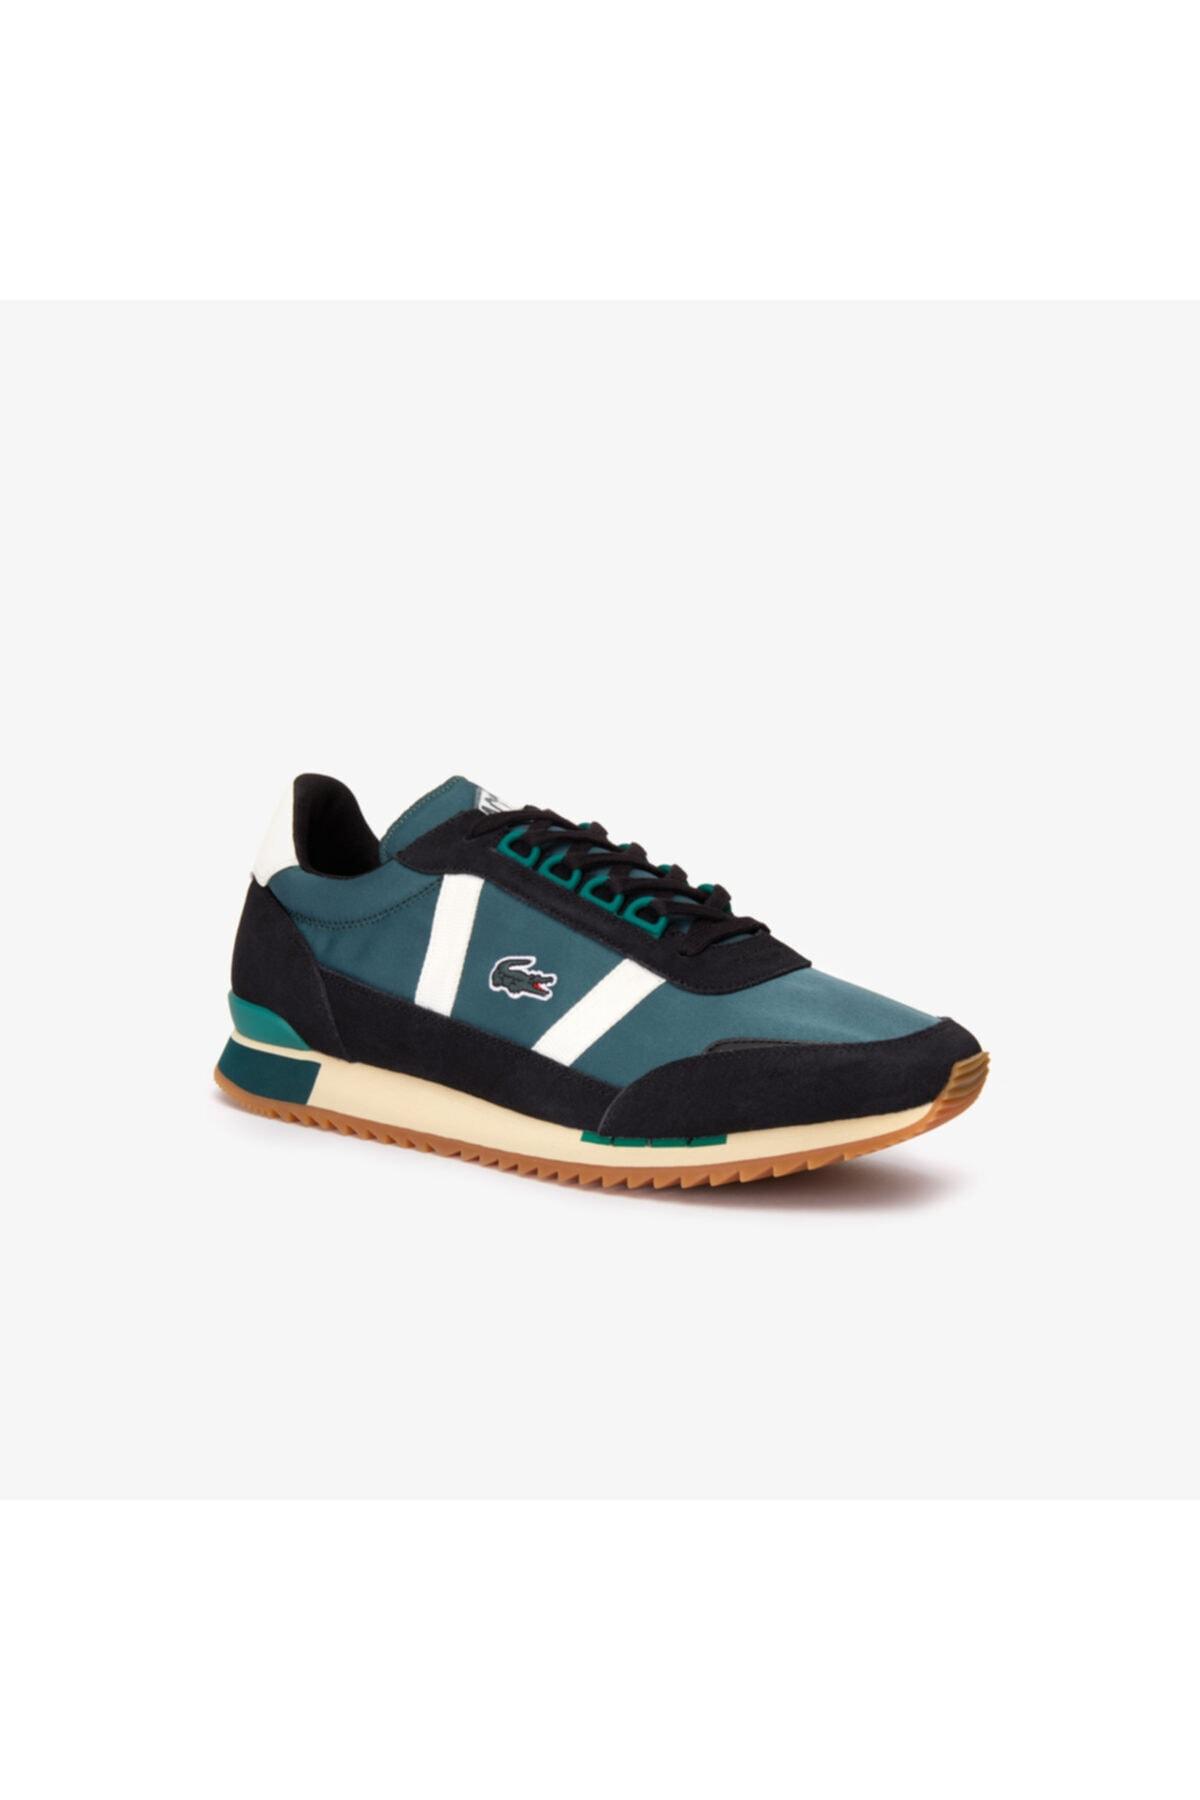 Lacoste Partner Retro 319 1 Sma Erkek Koyu Yeşil - Bej Sneaker 1